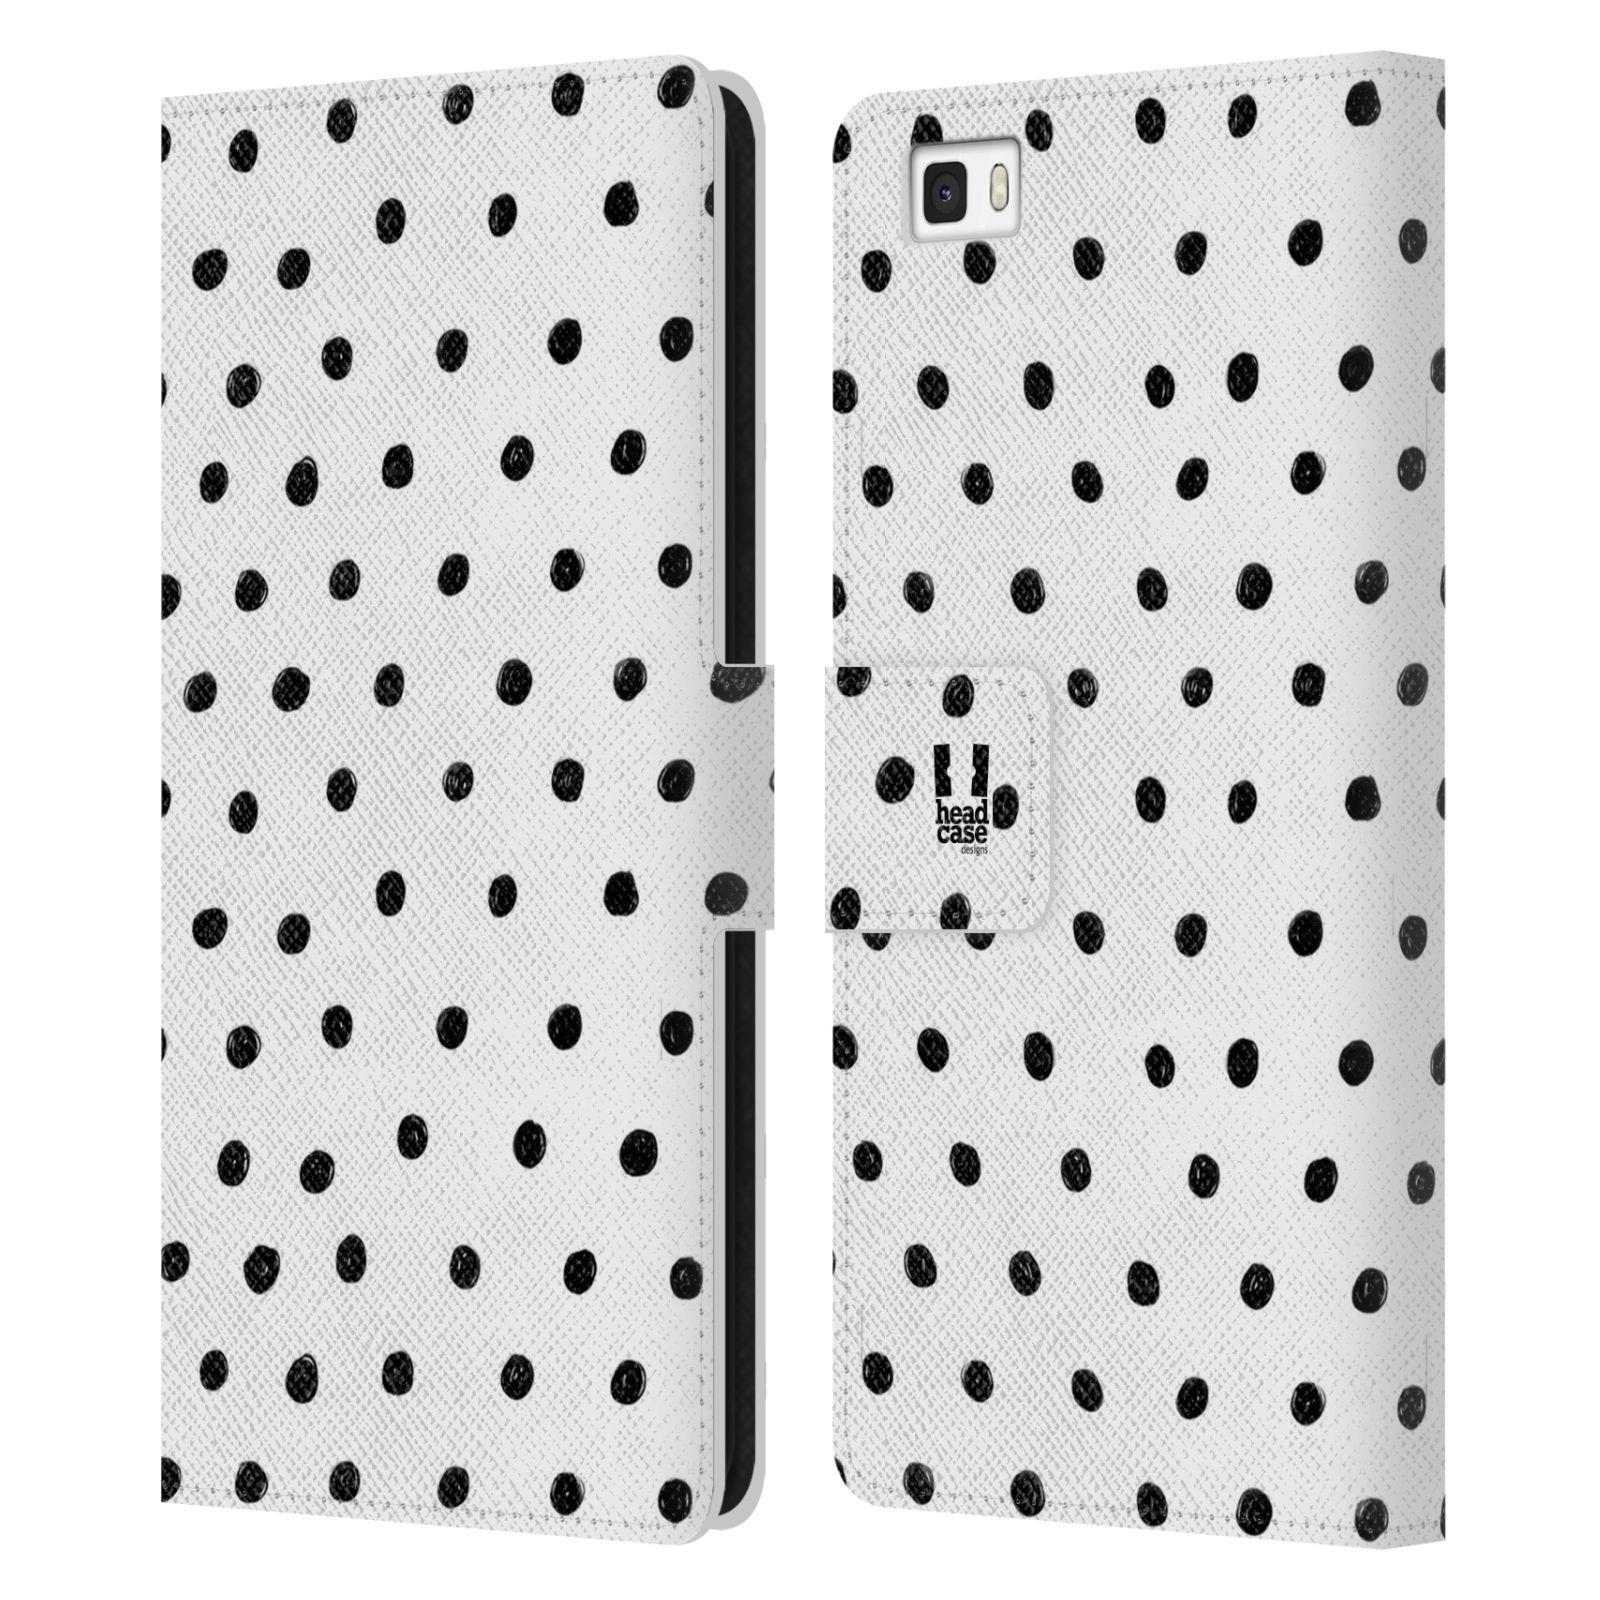 HEAD CASE Flipové pouzdro pro mobil Huawei P8 LITE kresba a čmáranice černé tečky a bílé pozadí